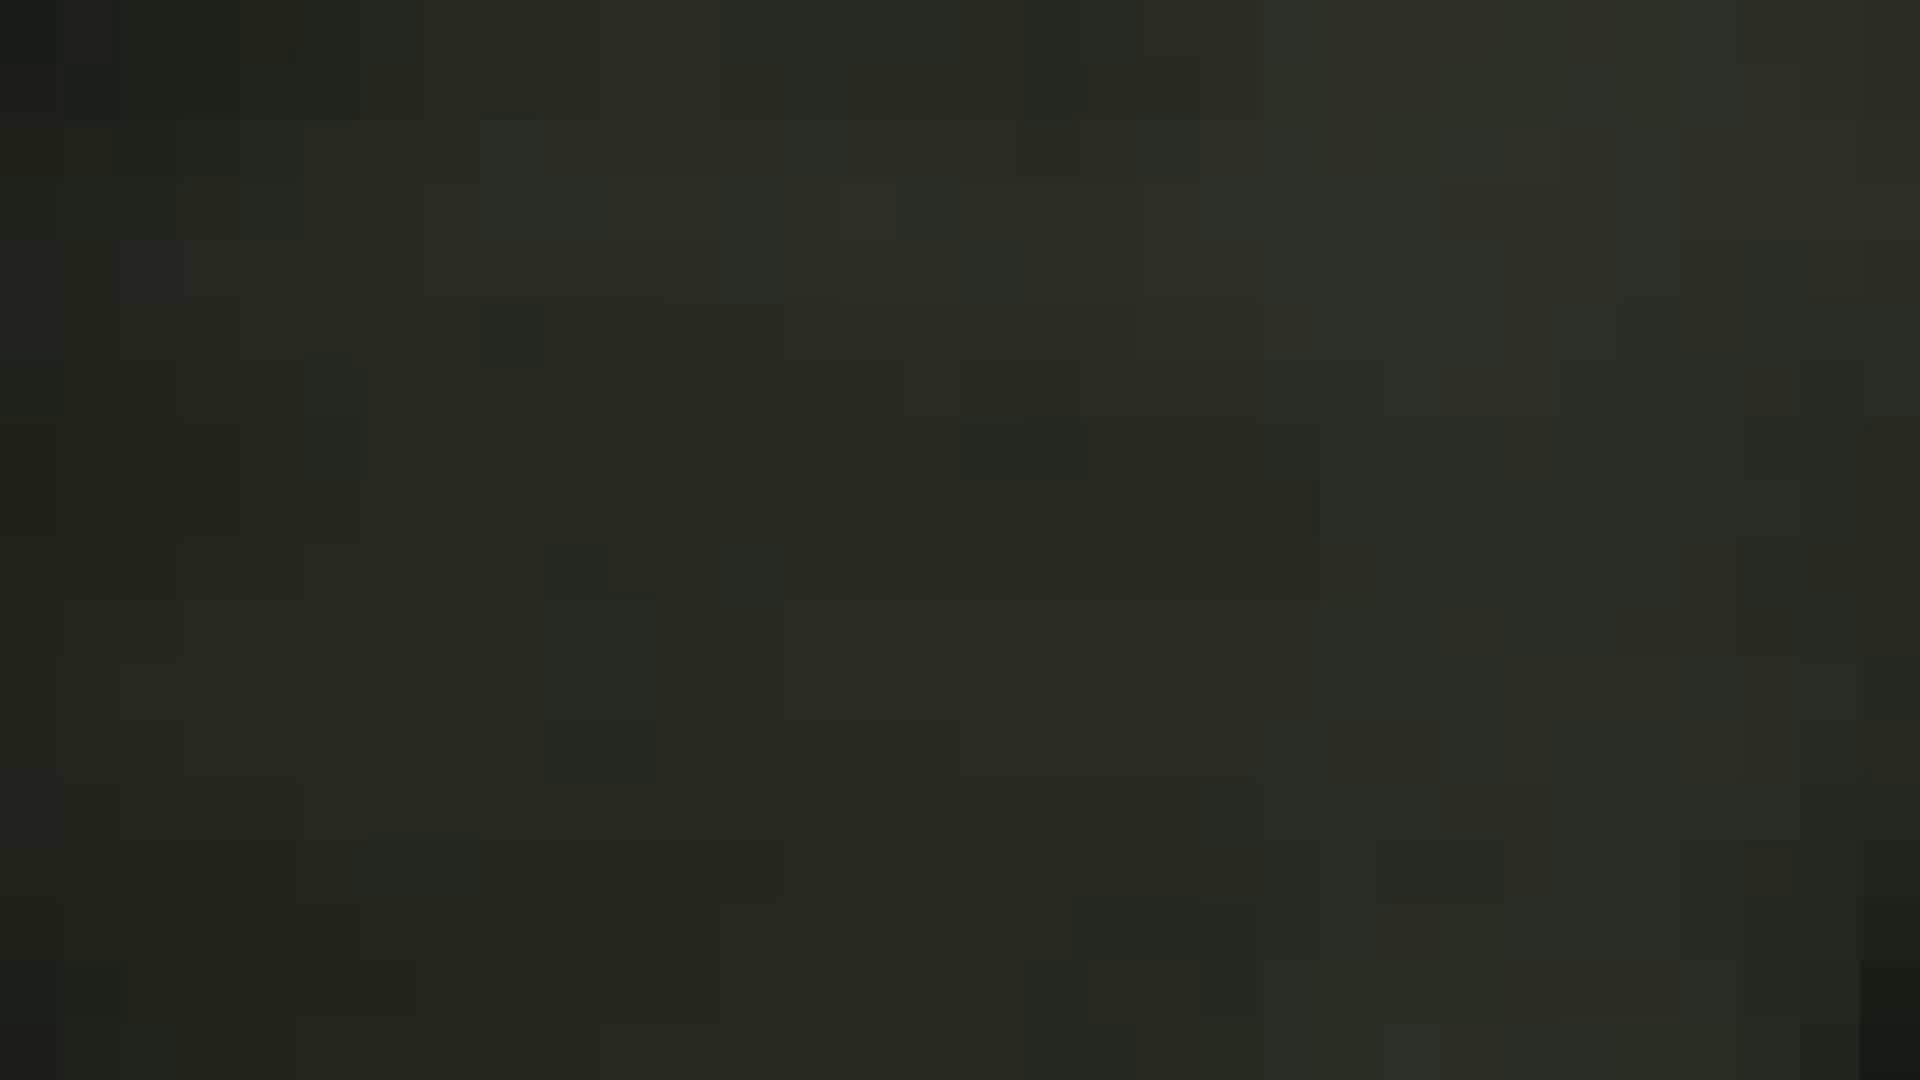 vol.25三十時間潜り、一つしか出会えない完璧桃尻編 byお銀 美人の裸体 おまんこ動画流出 106枚 14